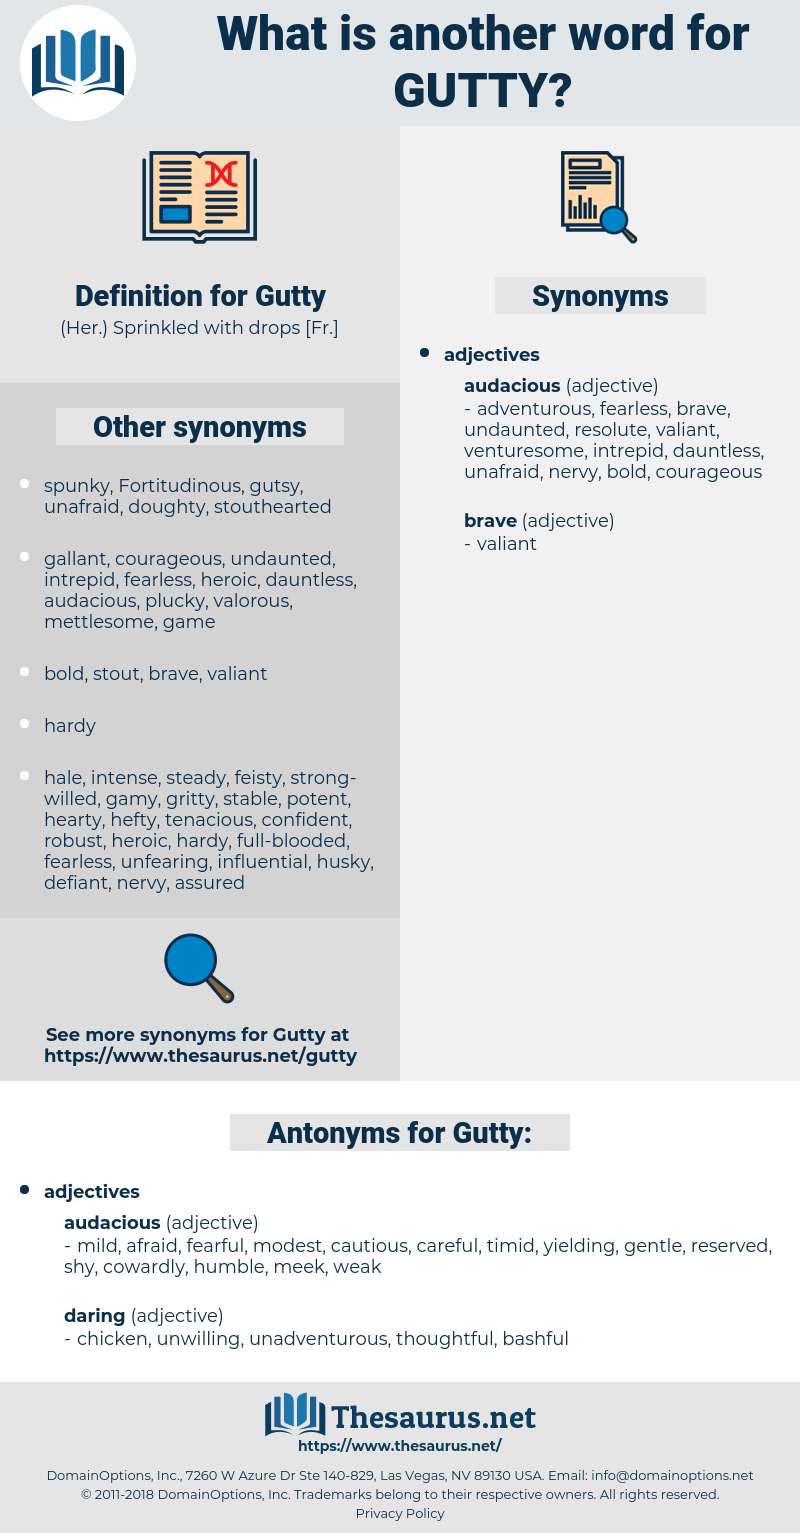 Gutty, synonym Gutty, another word for Gutty, words like Gutty, thesaurus Gutty